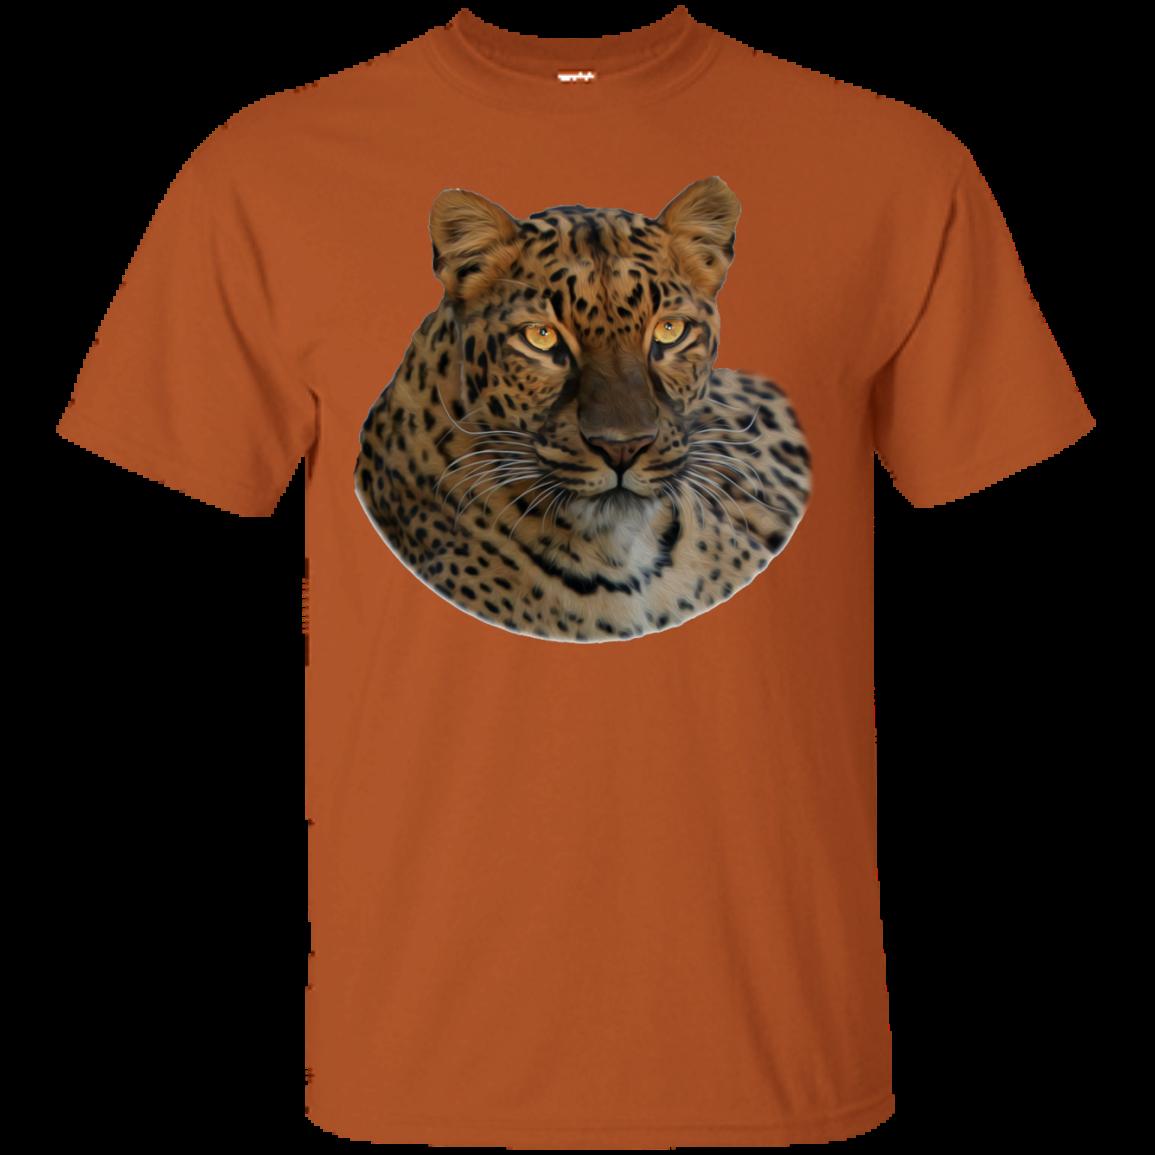 Haunting Eyes Jade Leopard Ultra Cotton TShirt Cotton